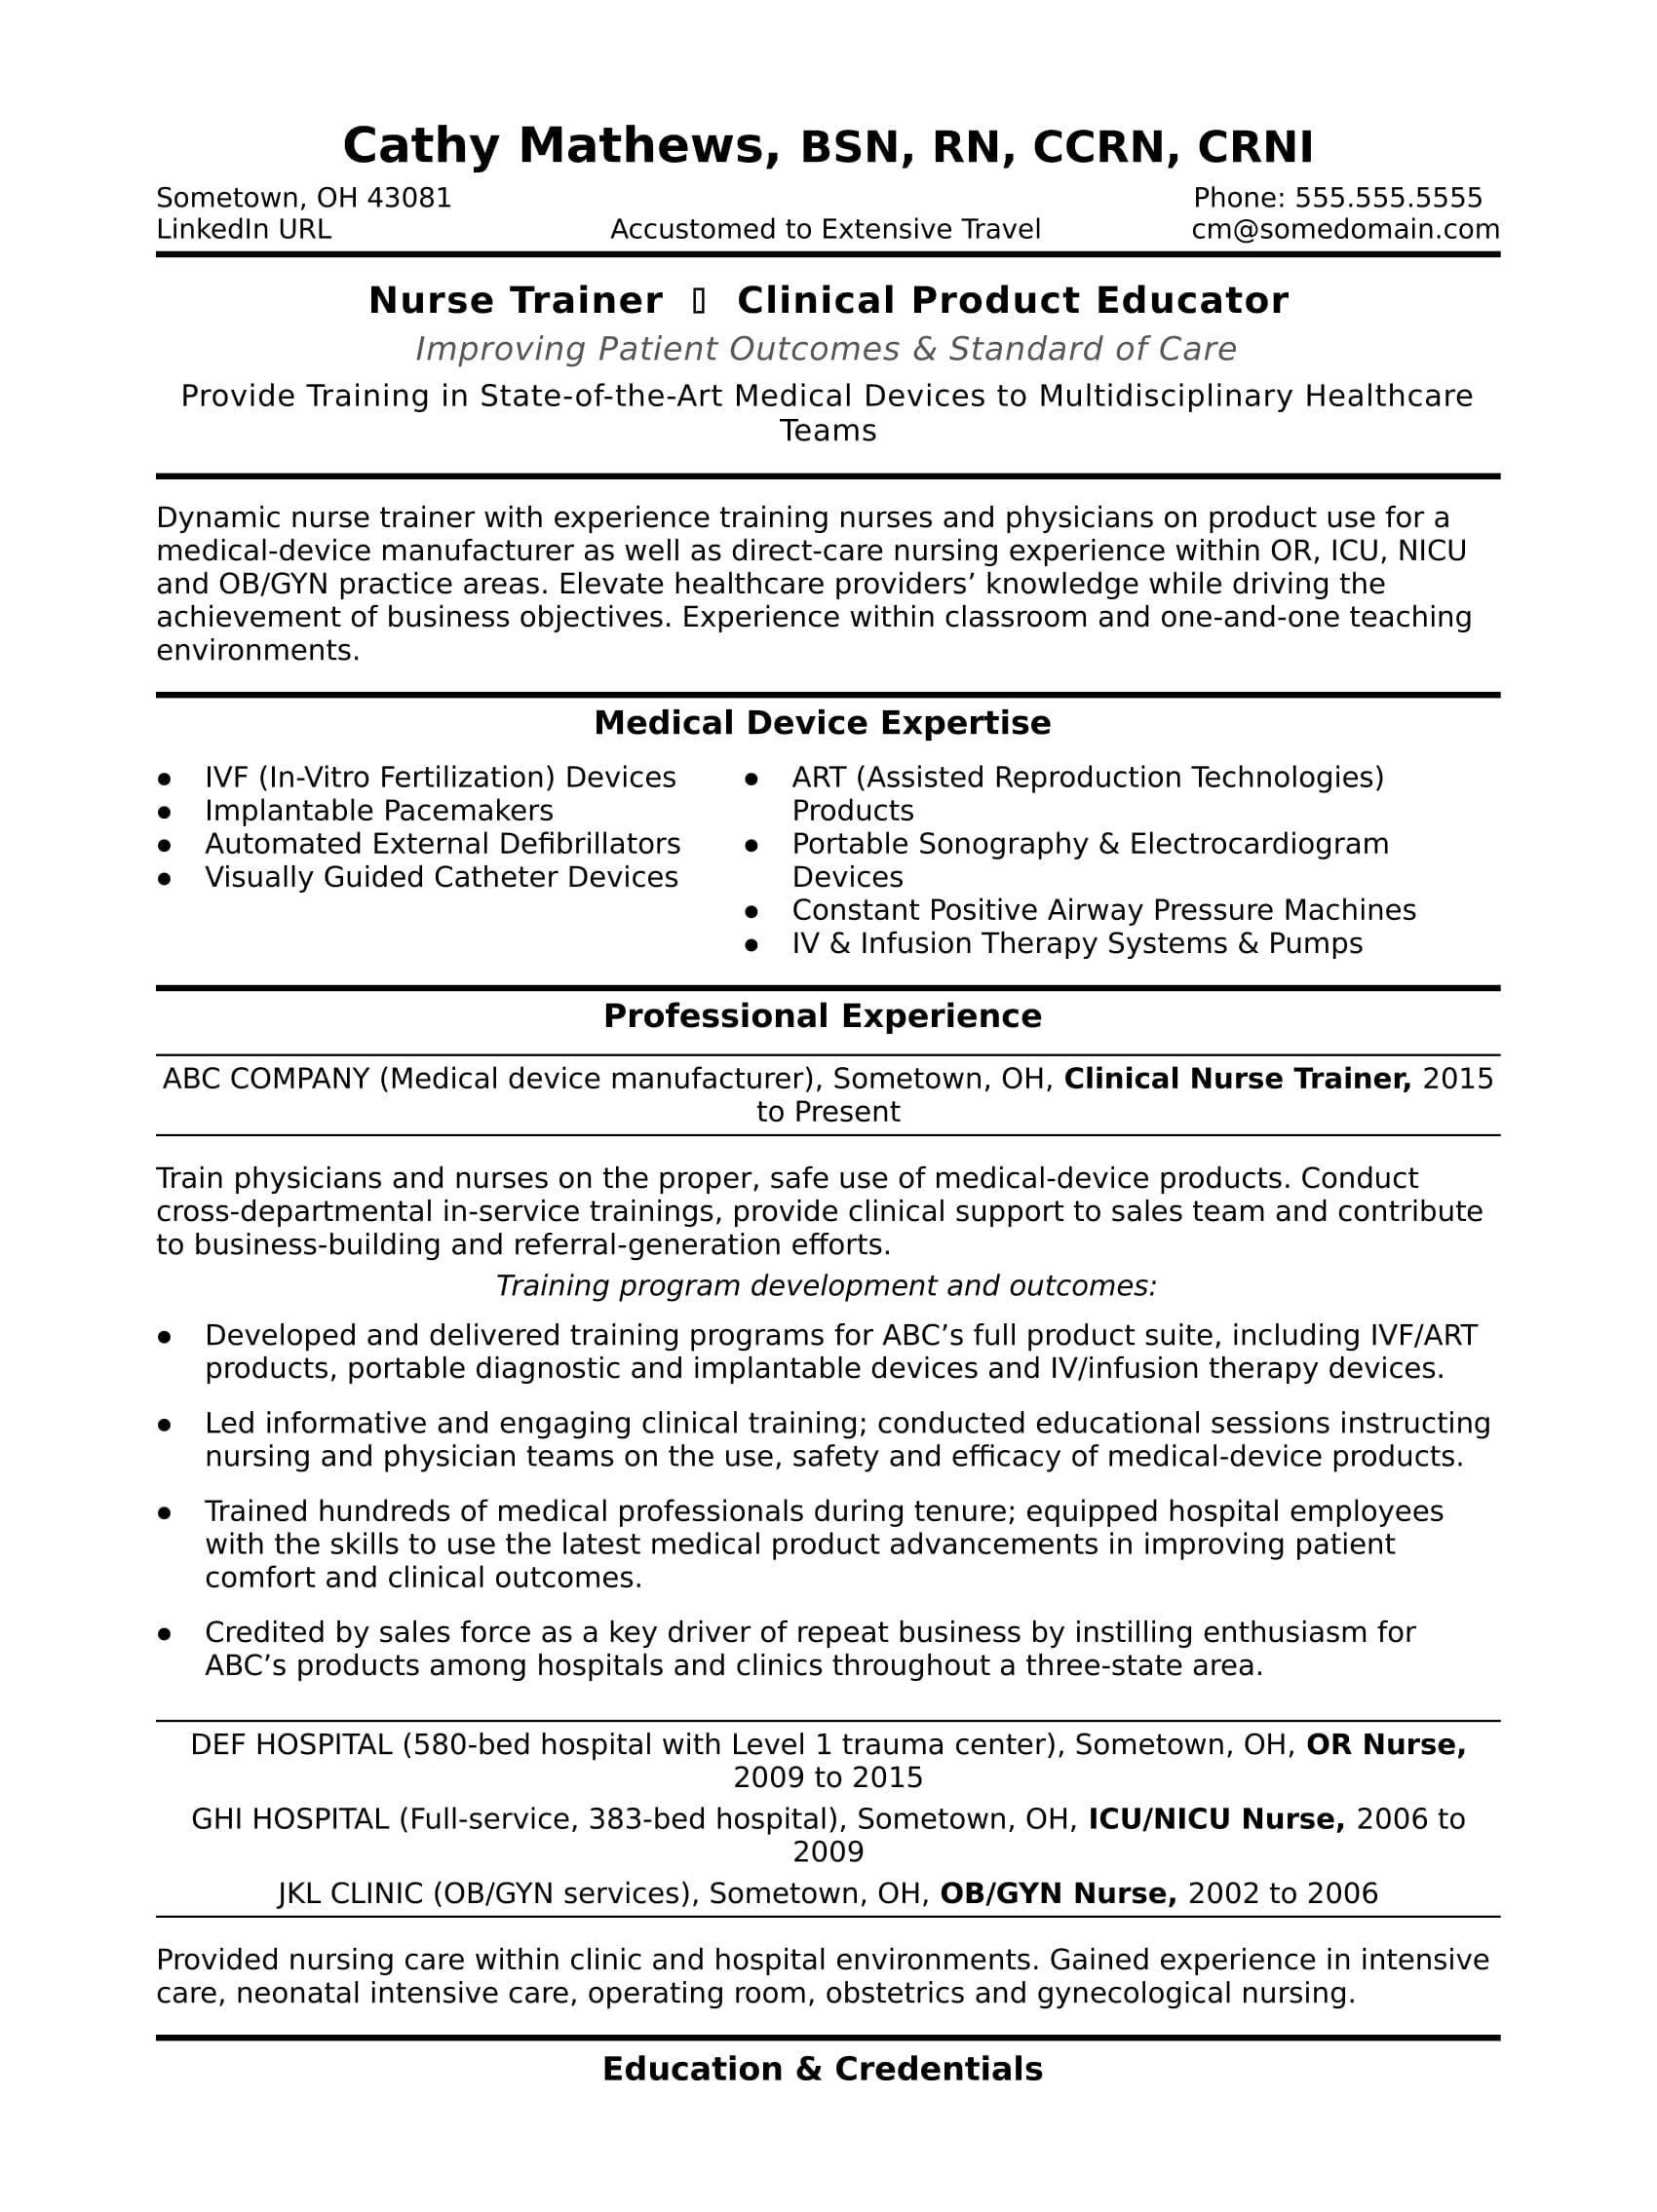 Nurse Trainer Resume Sample Monster Com